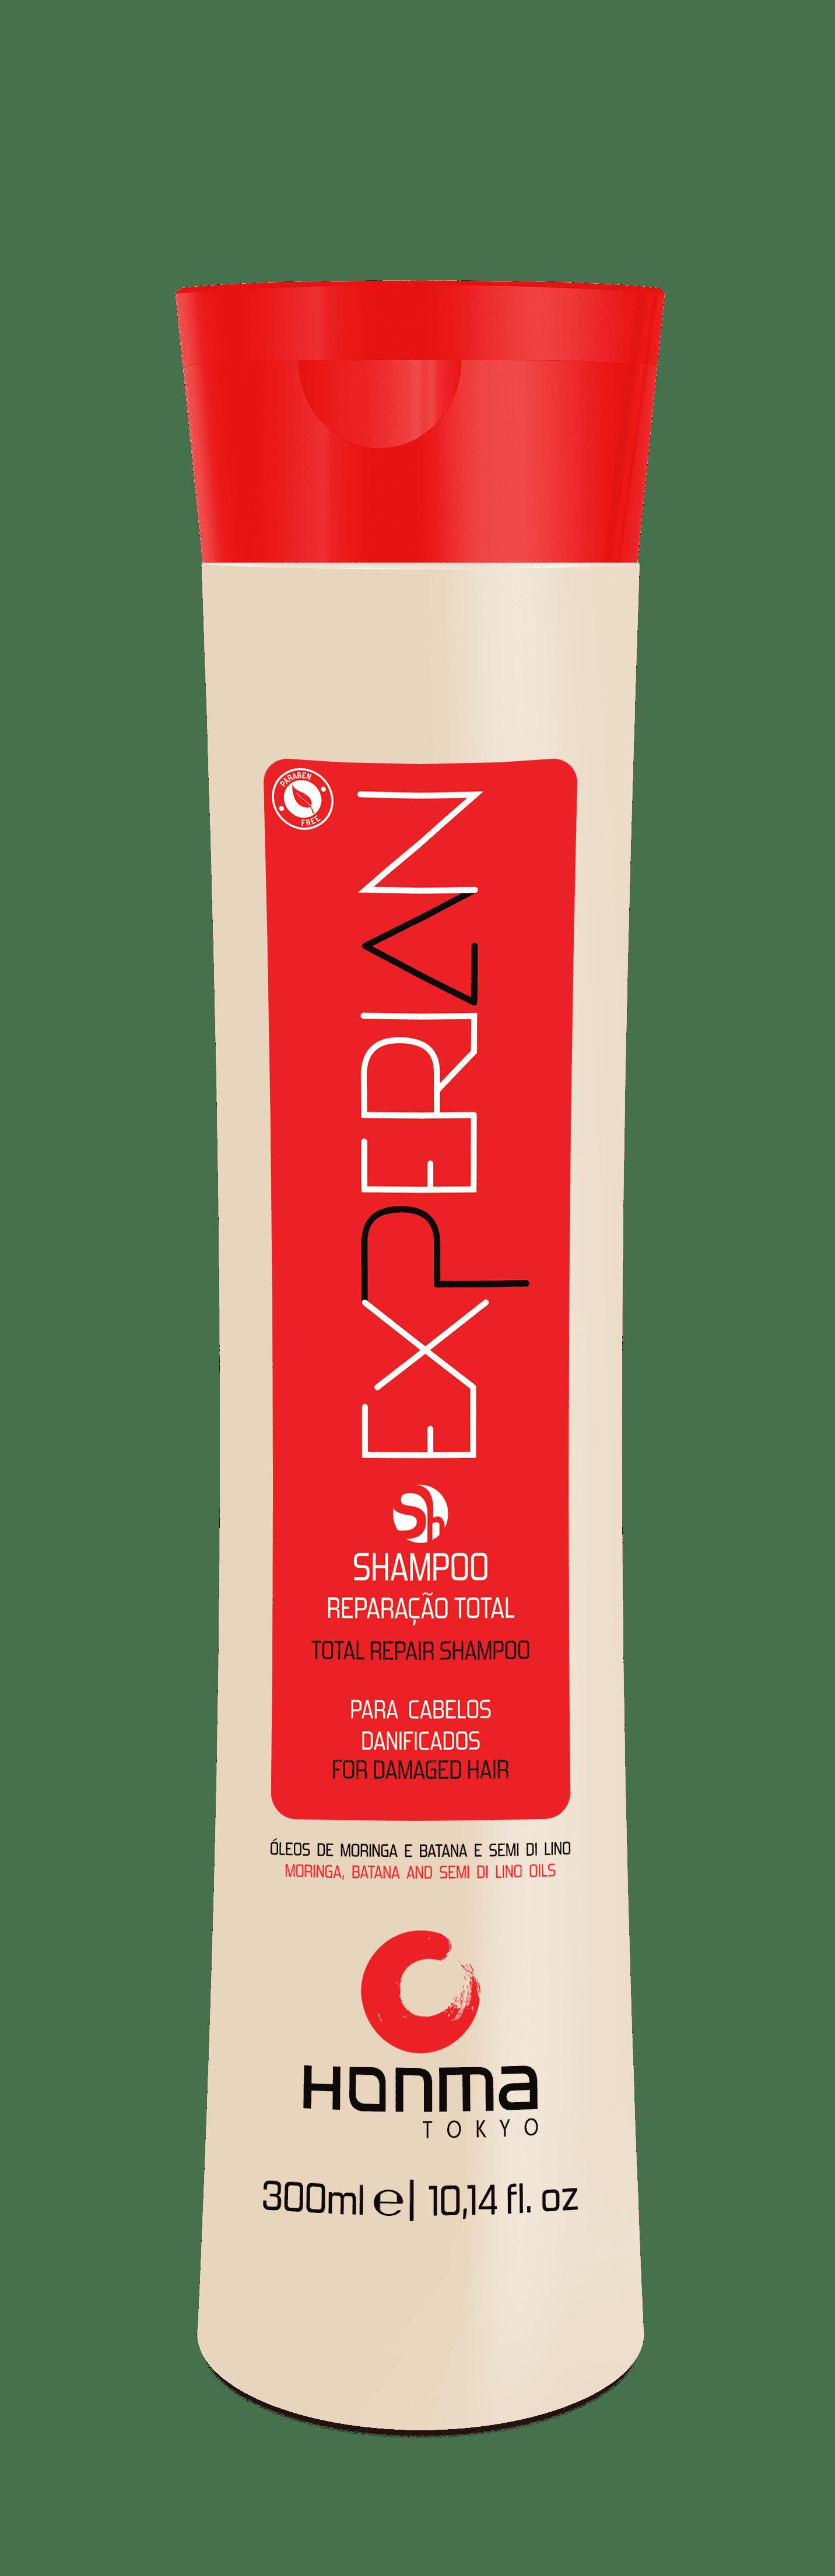 Honma Tokyo Шампунь Линии «Experian», 300 мл honma tokyo шампунь глубокой очистки линии n solutions 1000 мл